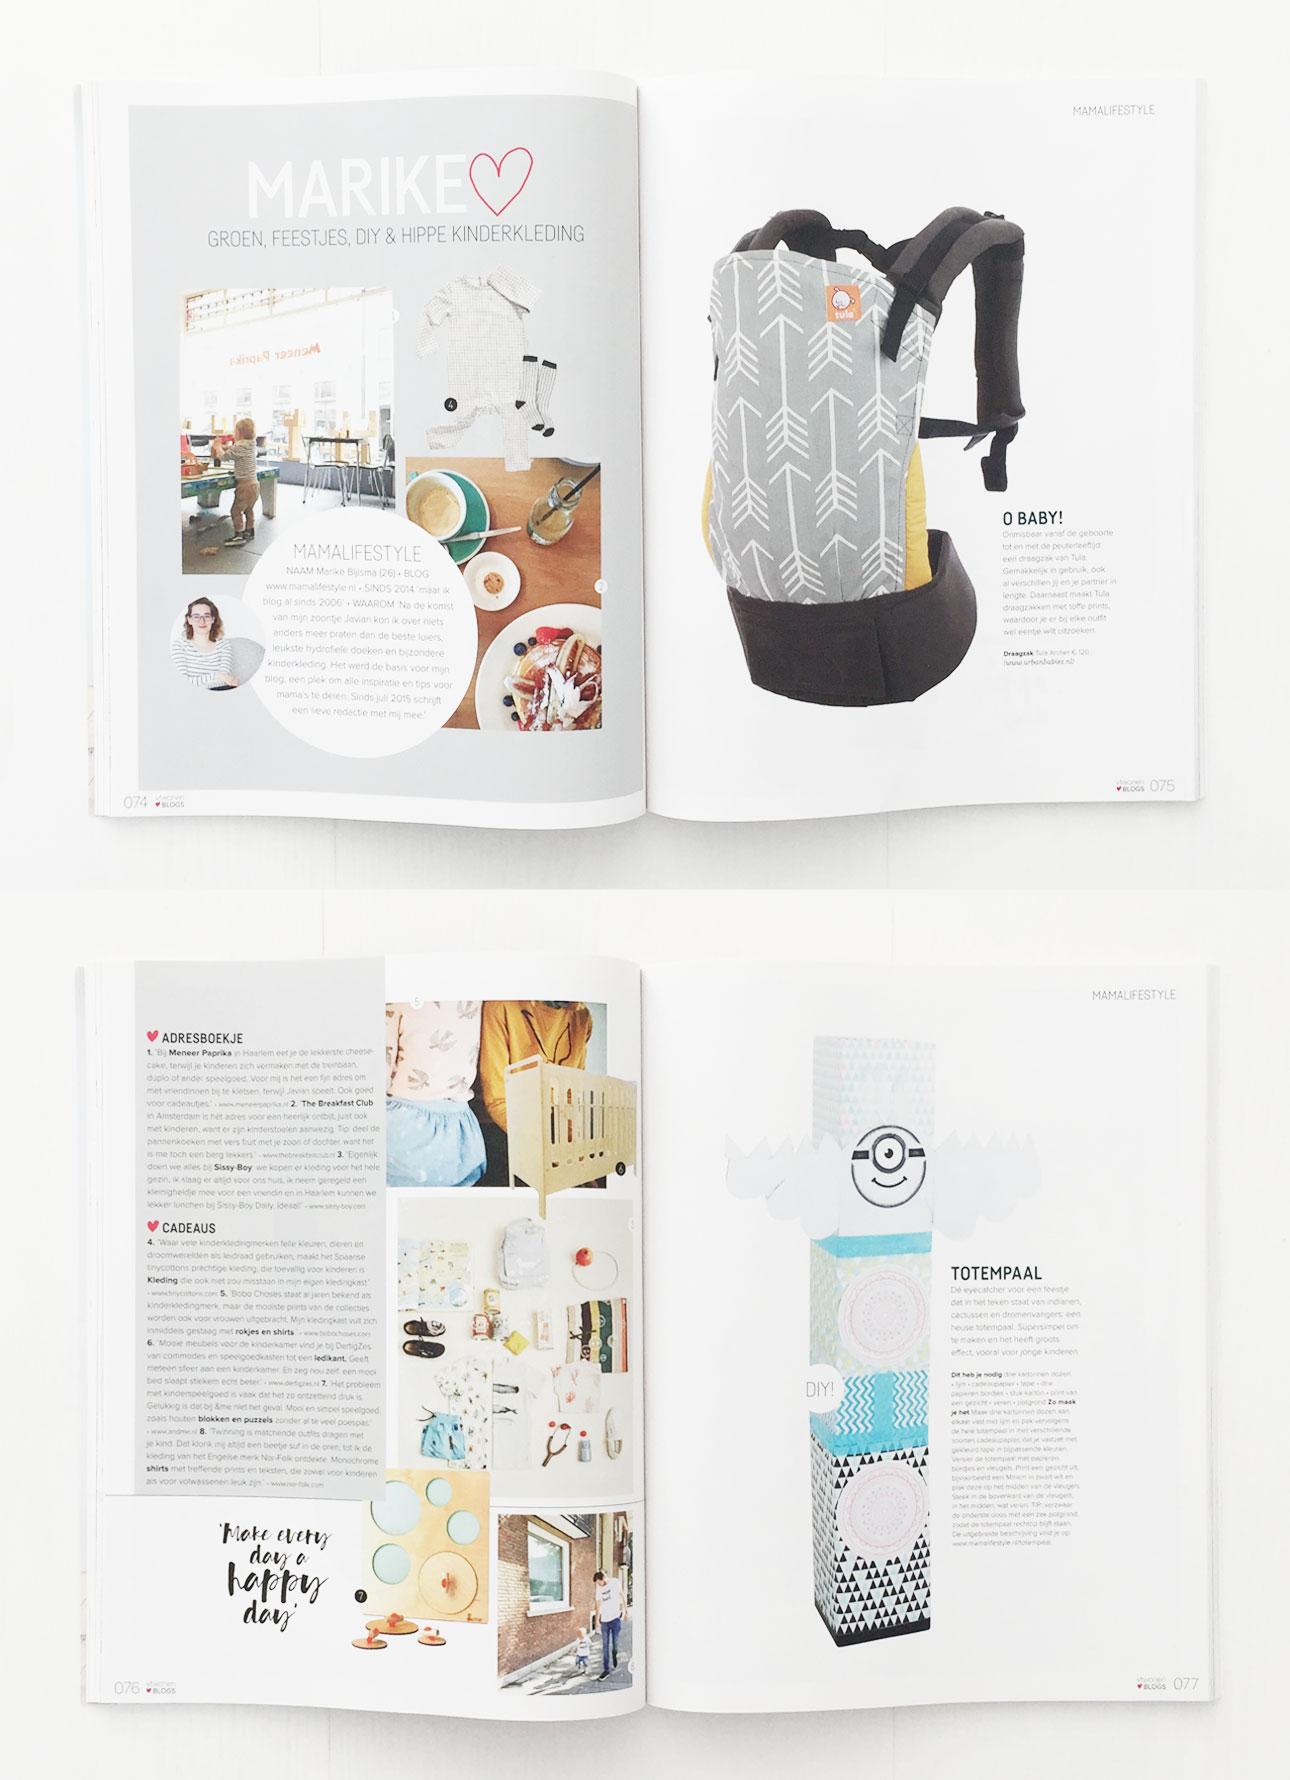 vtwonen-loves-blogs-magazine-marike-mamalifestyle